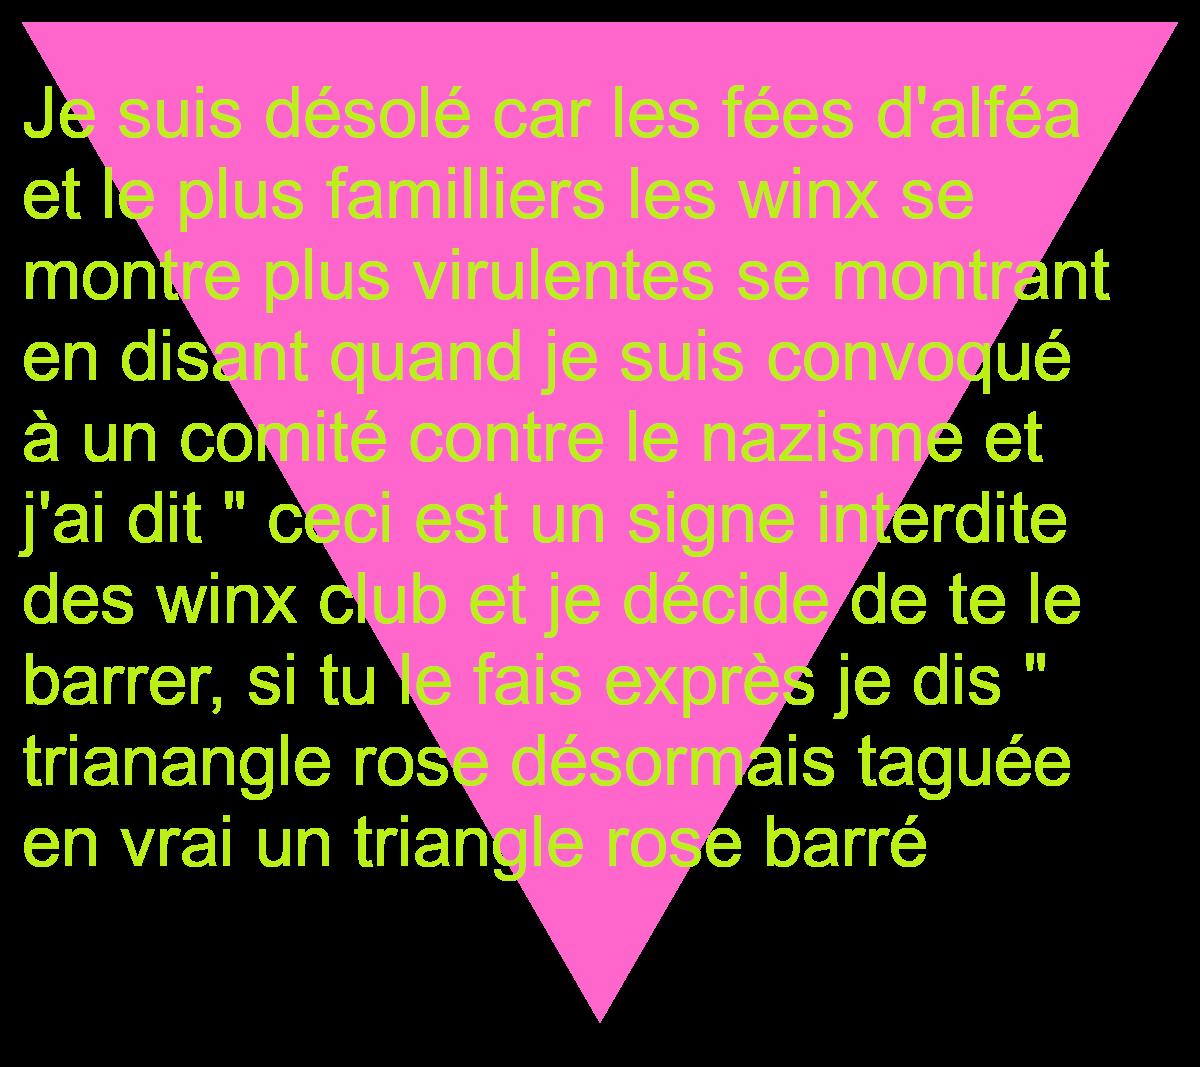 triangle rose barrée